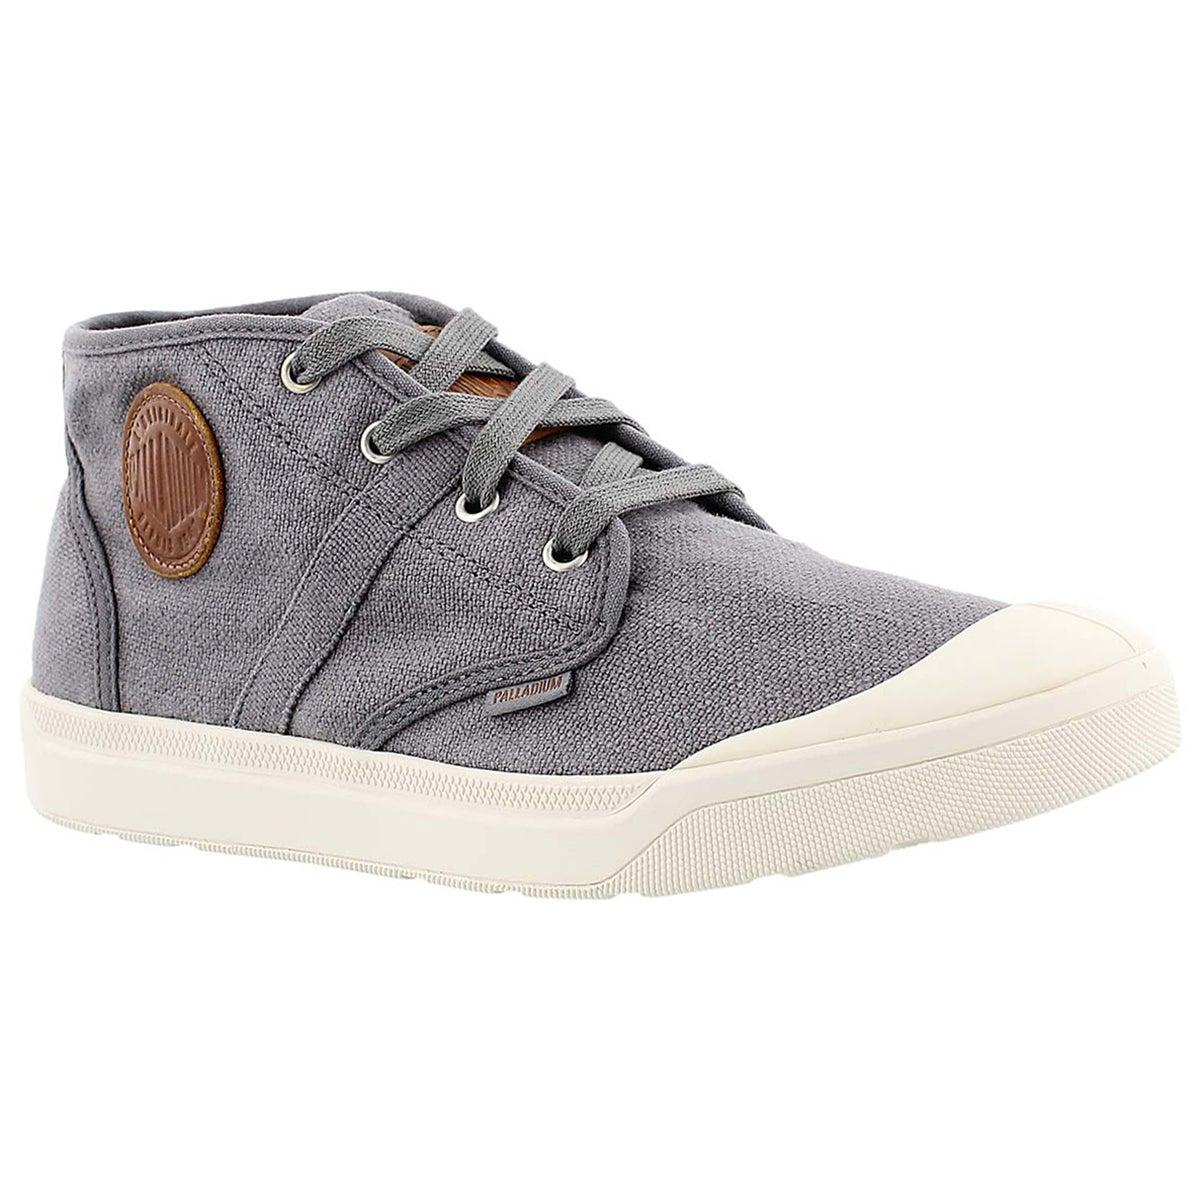 Men's PALLARUE MID castlerock sneakers